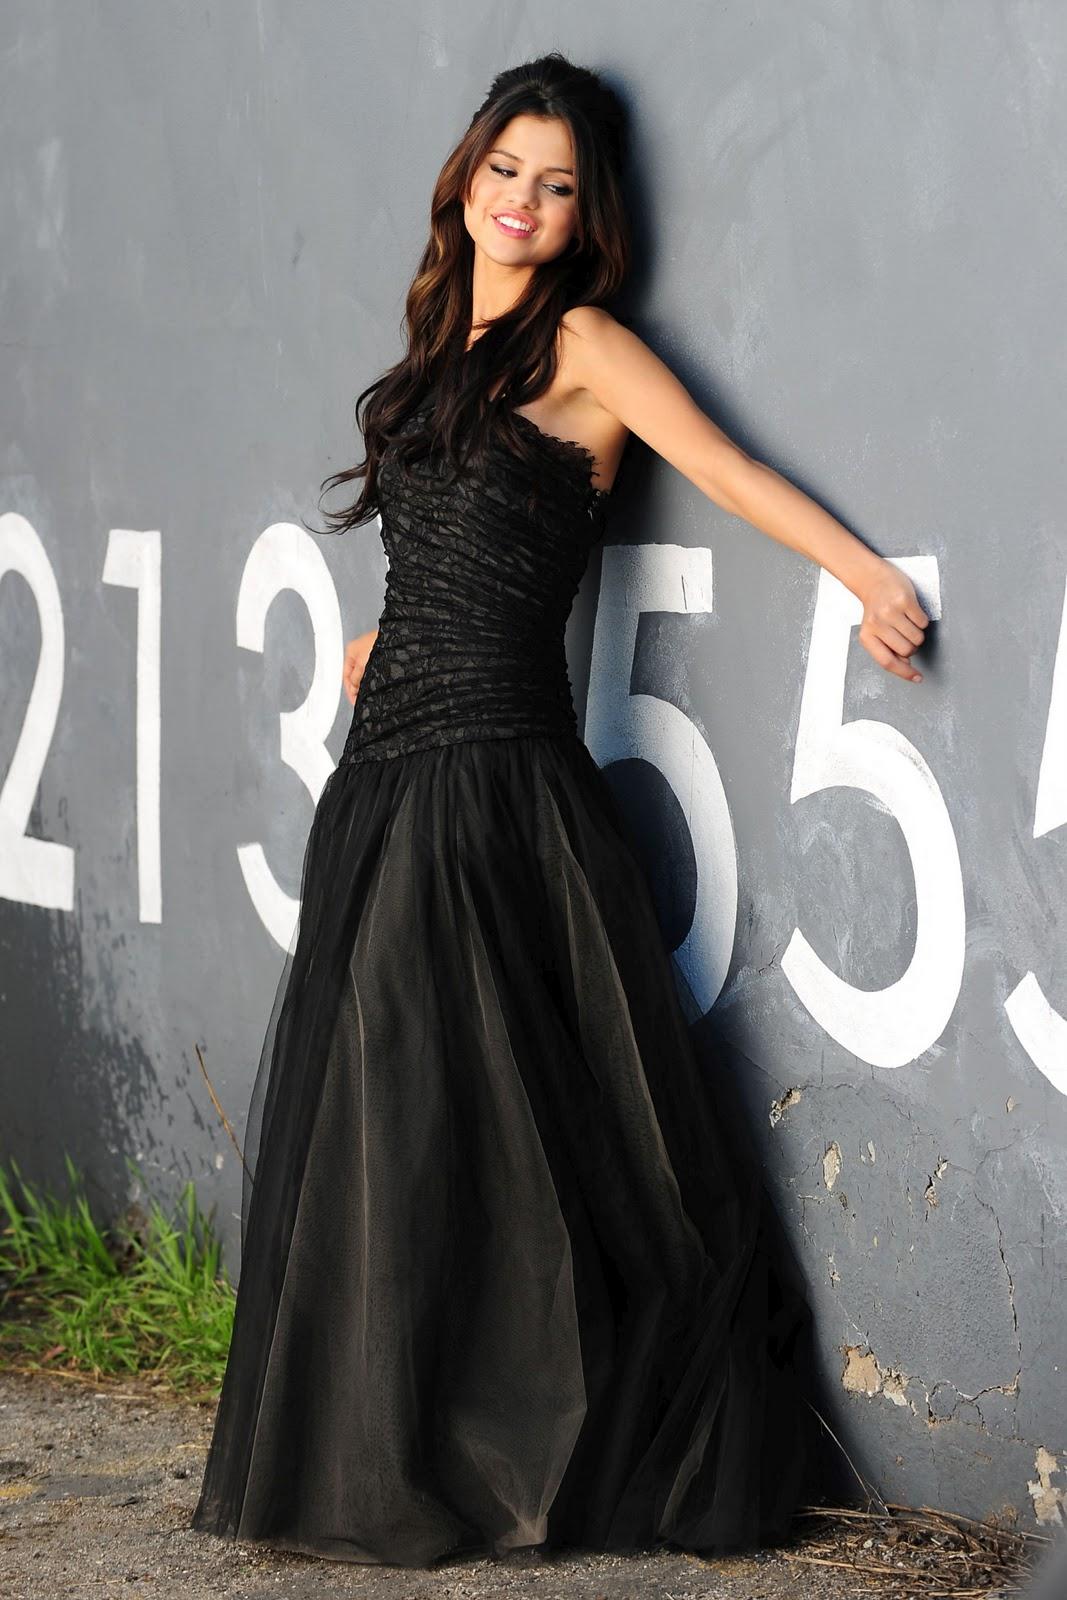 http://3.bp.blogspot.com/-l7HujzMtfNE/TV7C5LwUV8I/AAAAAAAACO0/mUk7L_AvbyU/s1600/Selena-Gomez-101.jpg